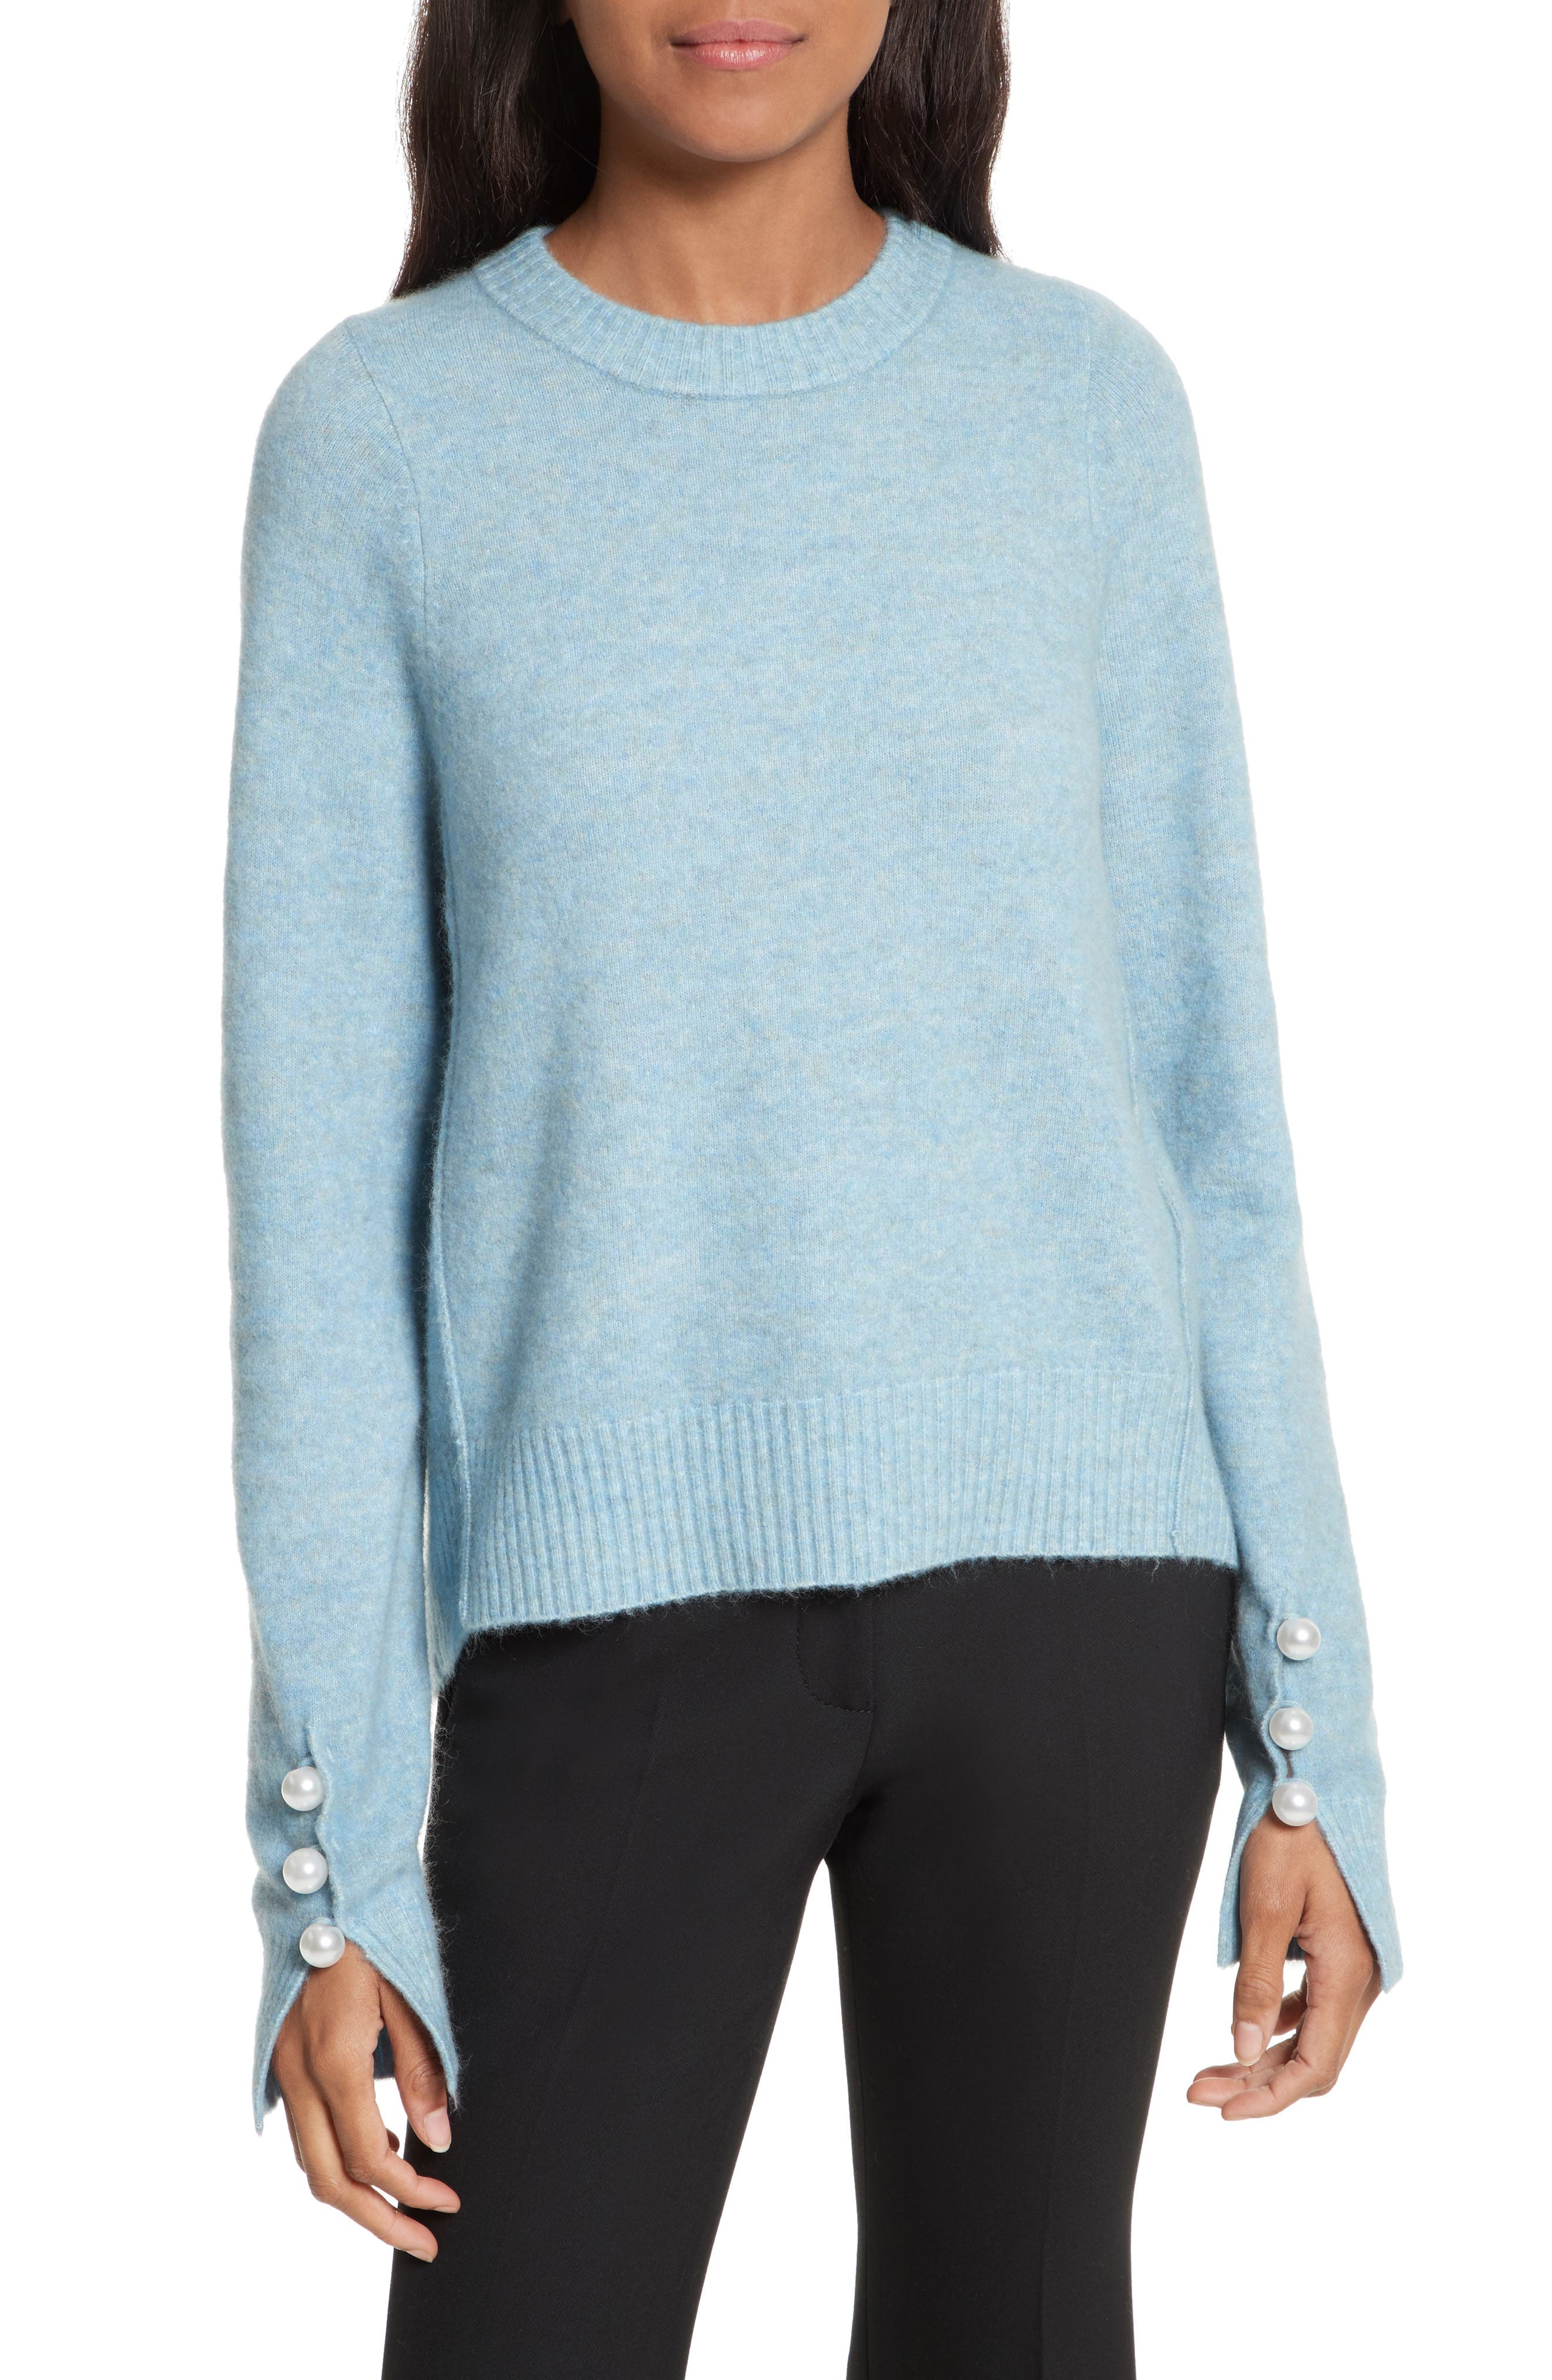 3.1 PHILLIP LIM Faux Pearl Cuff Knit Pullover